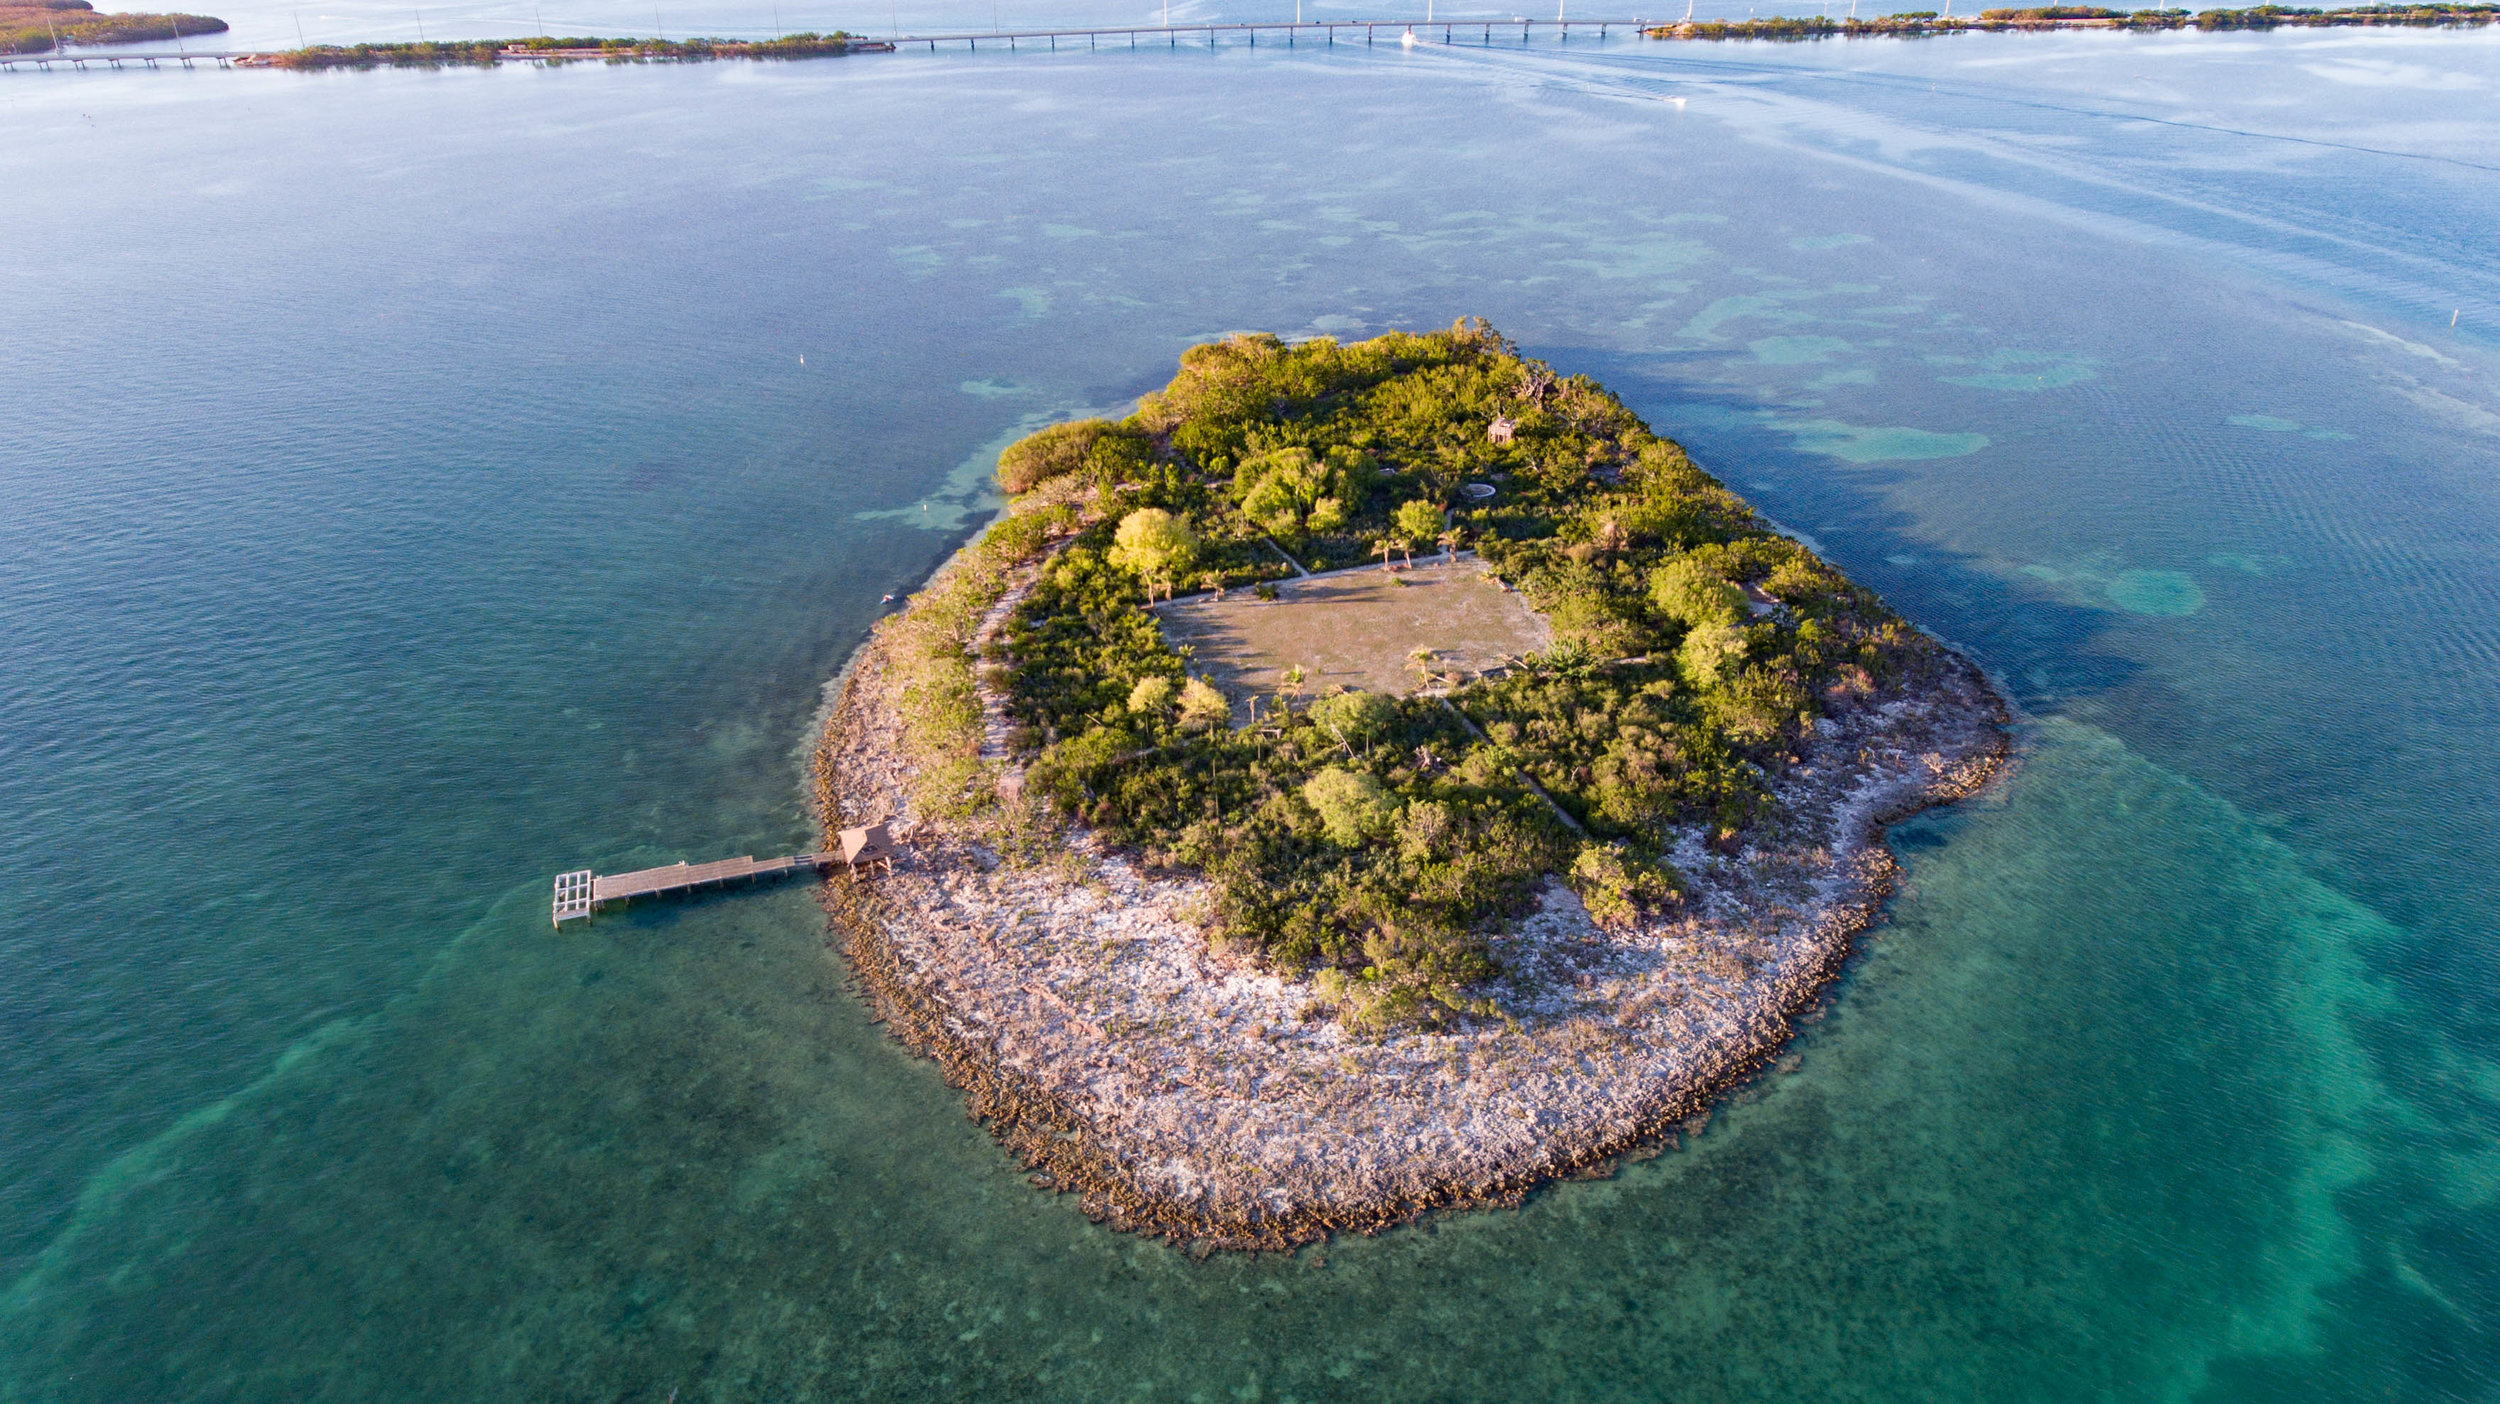 iNDIAN KEY, FLORIDA credit: DAVID GROSS / coral reef image bank